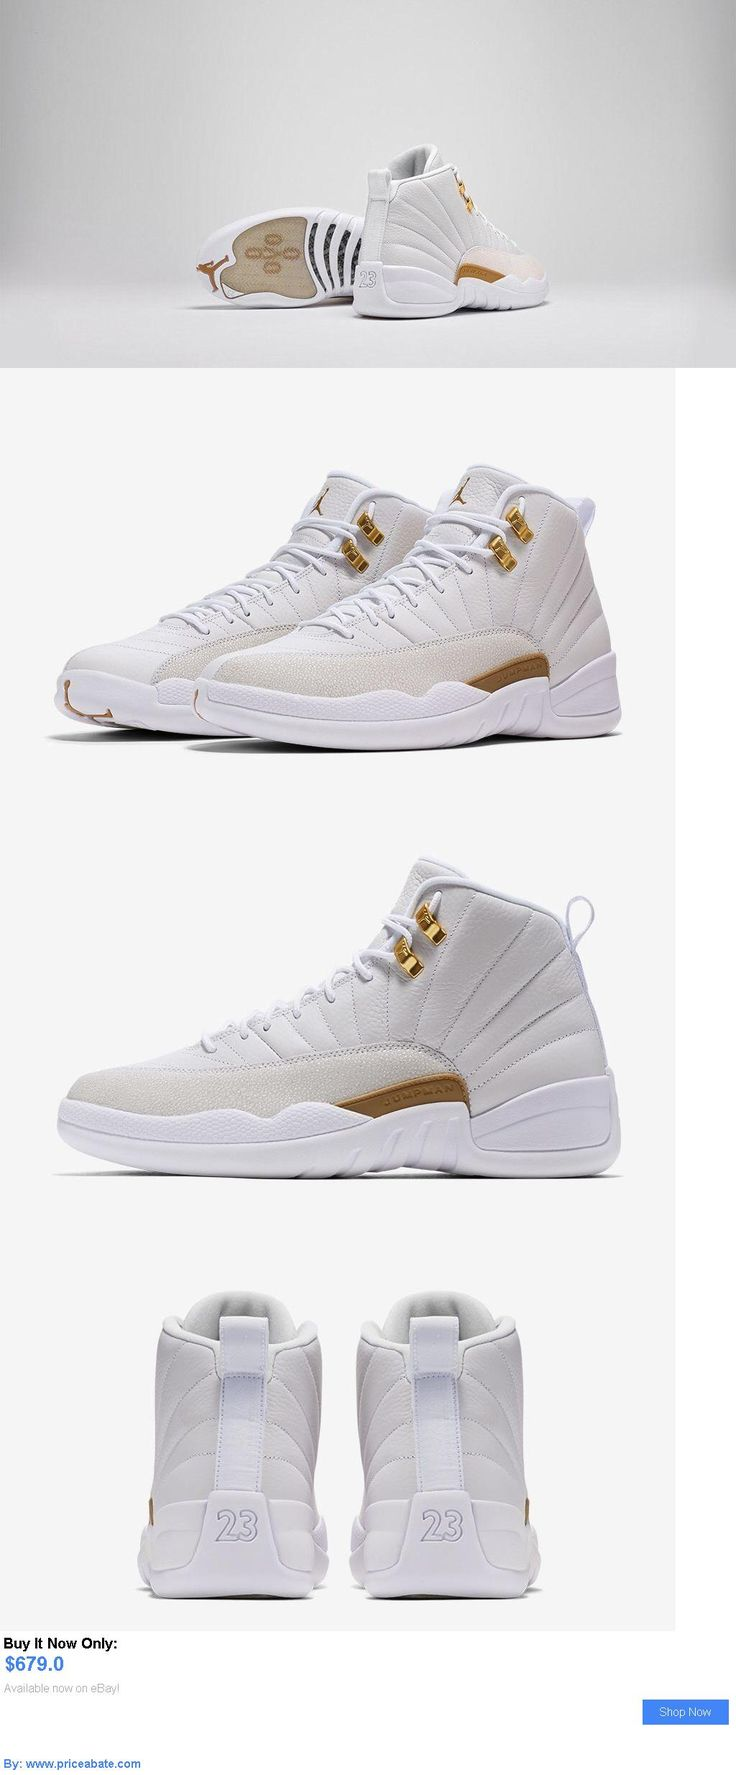 Men Shoes: Nike Air Jordan 12 X11 Ovo White Drake 2016 Mens Us Size 8 New BUY IT NOW ONLY: $679.0 #priceabateMenShoes OR #priceabate